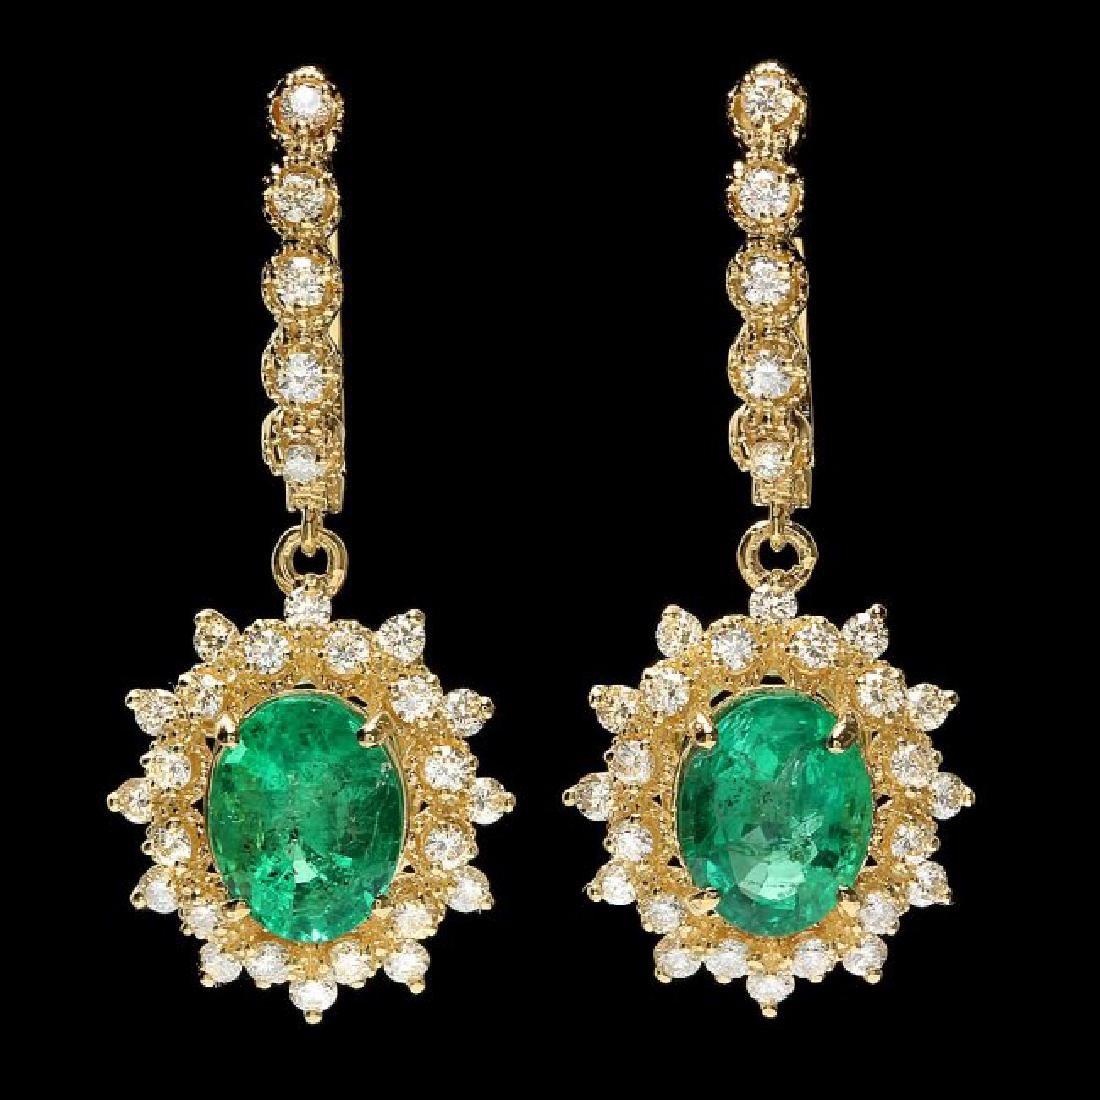 14k Gold 4ct Emerald 1.55ct Diamond Earrings